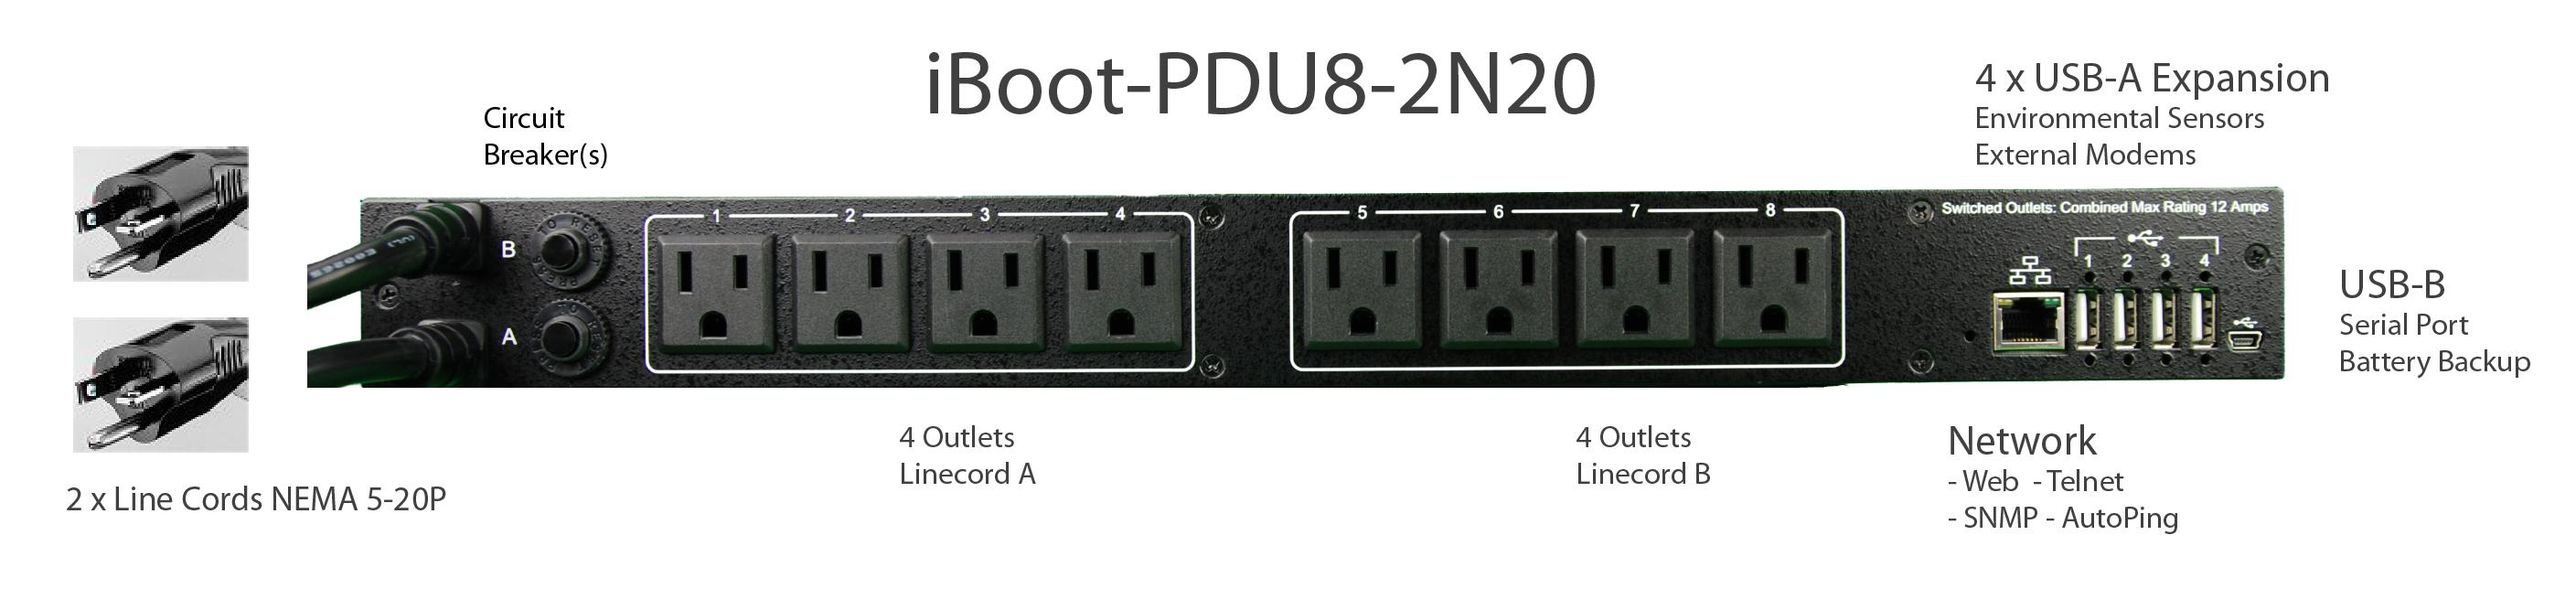 iBoot-PDU8-2N20 for Remote Reboot, 2 x NEMA 5-20P.